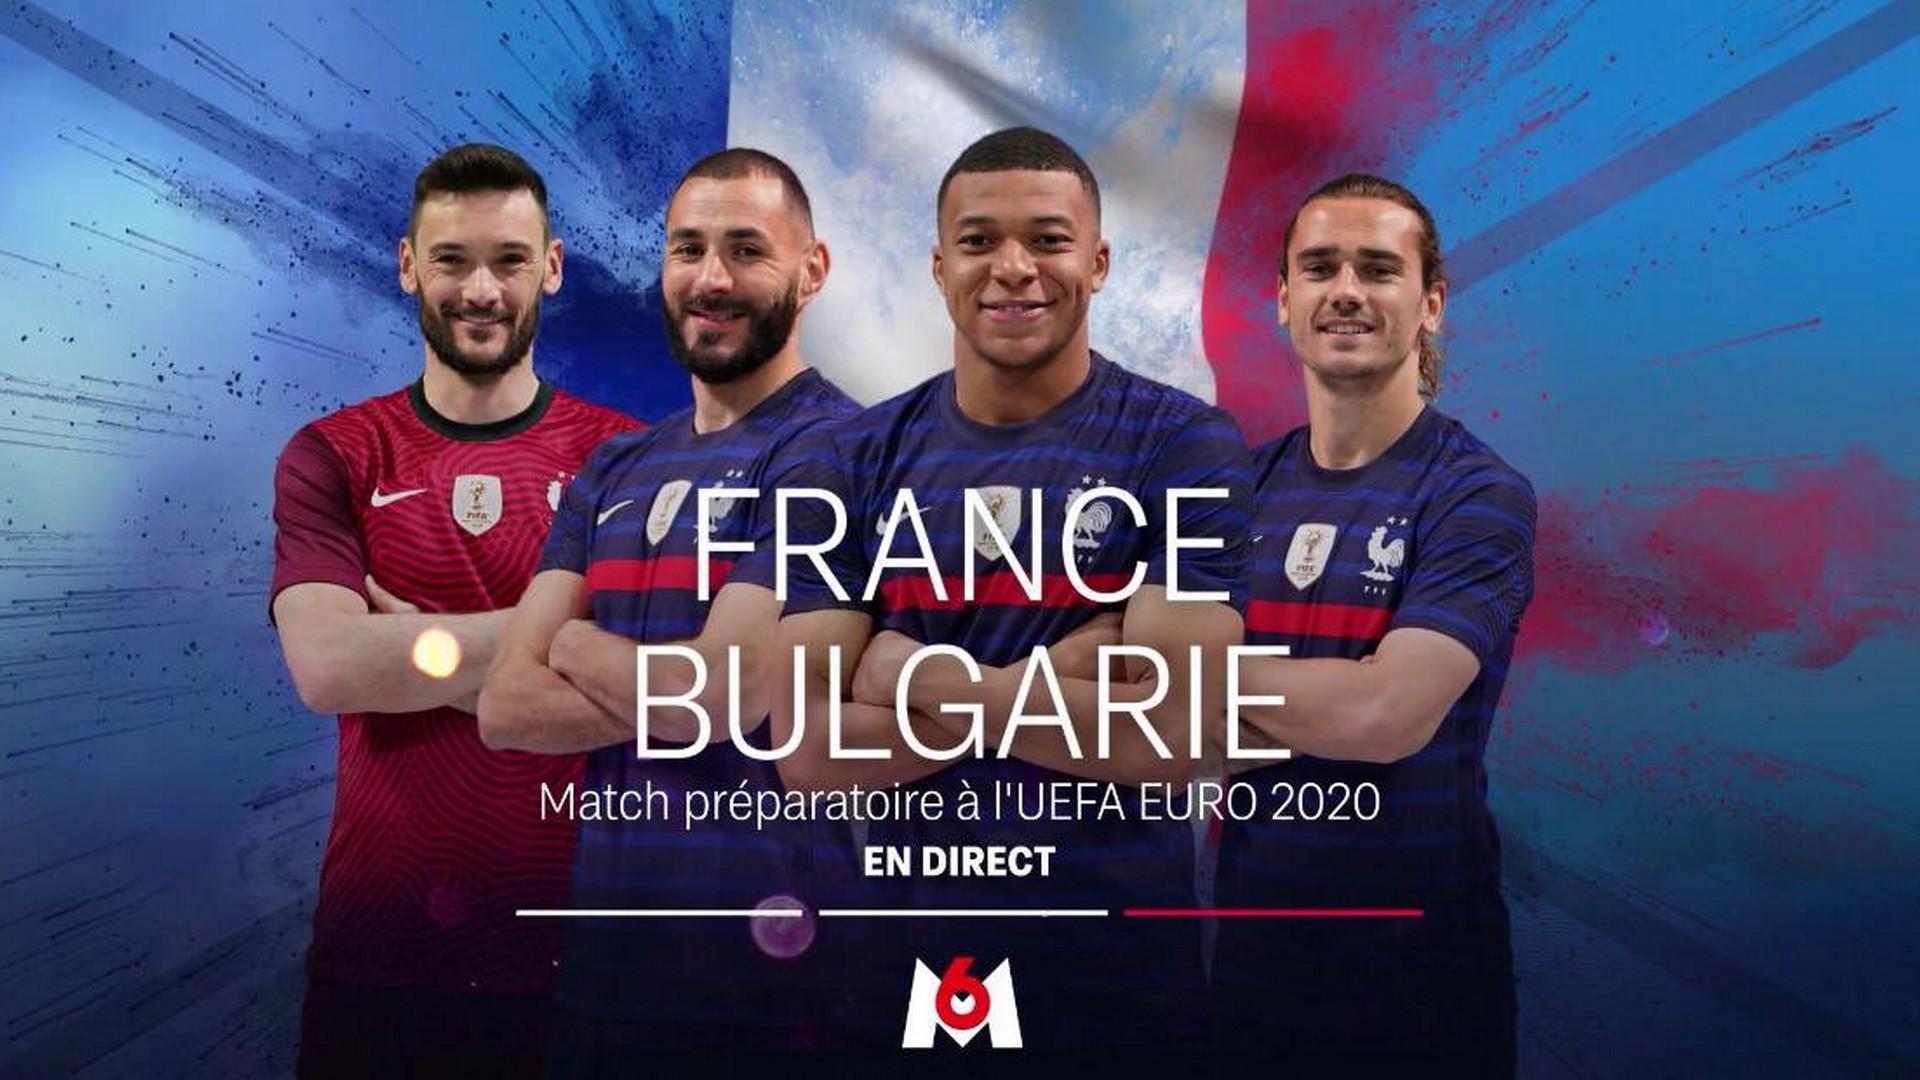 Football – France Bulgarie M6 8 juin 2021